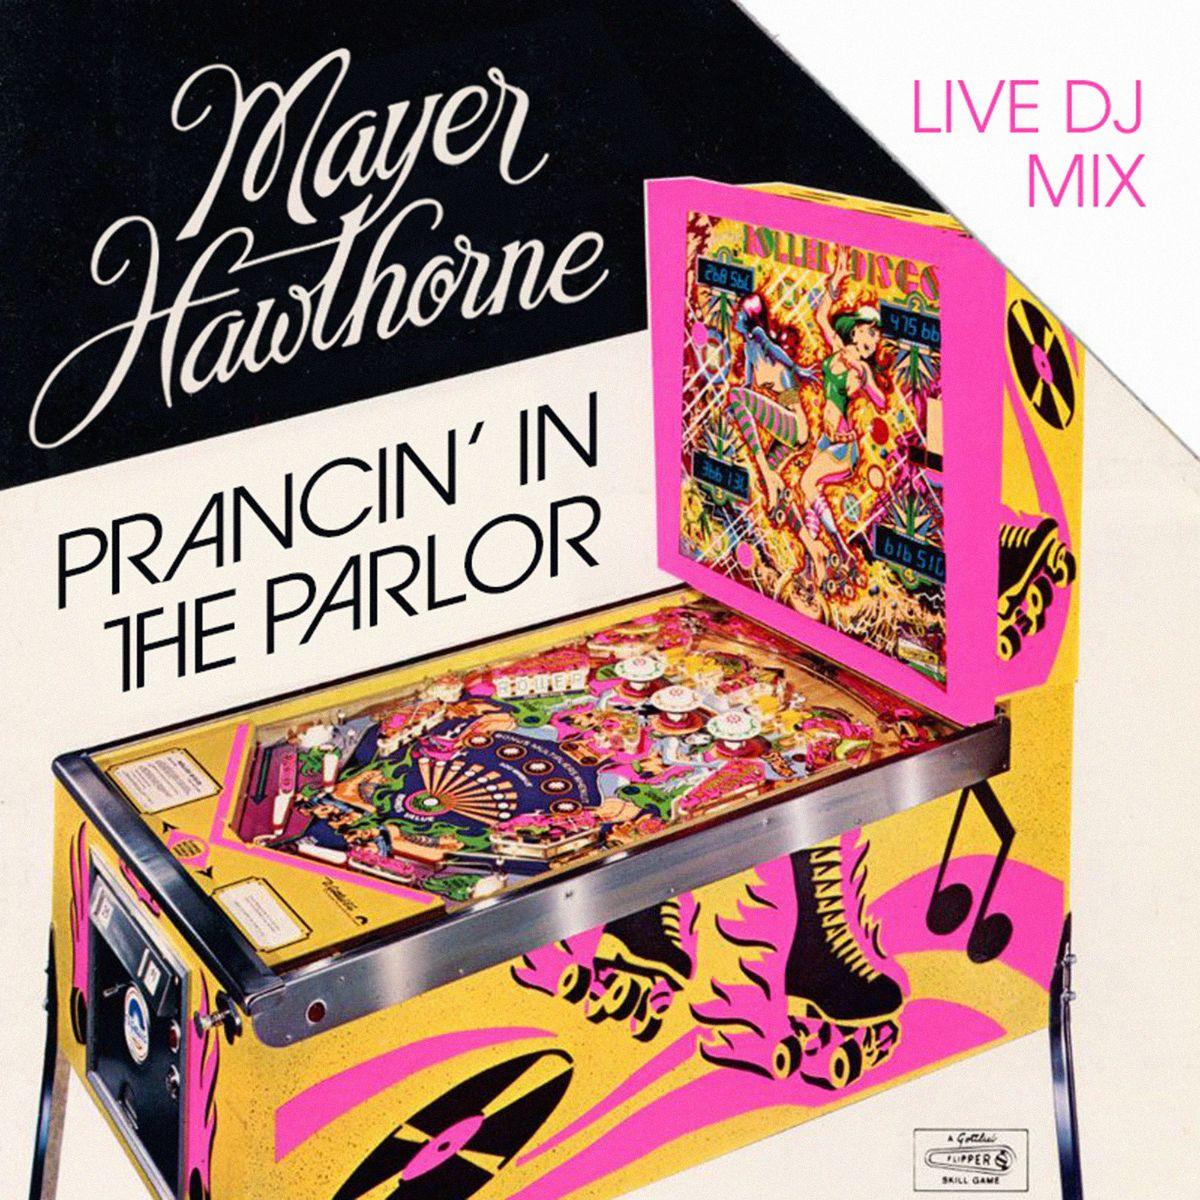 Prancin' in the Parlor | Ein Live DJ Mix on Mayer Hawthorne